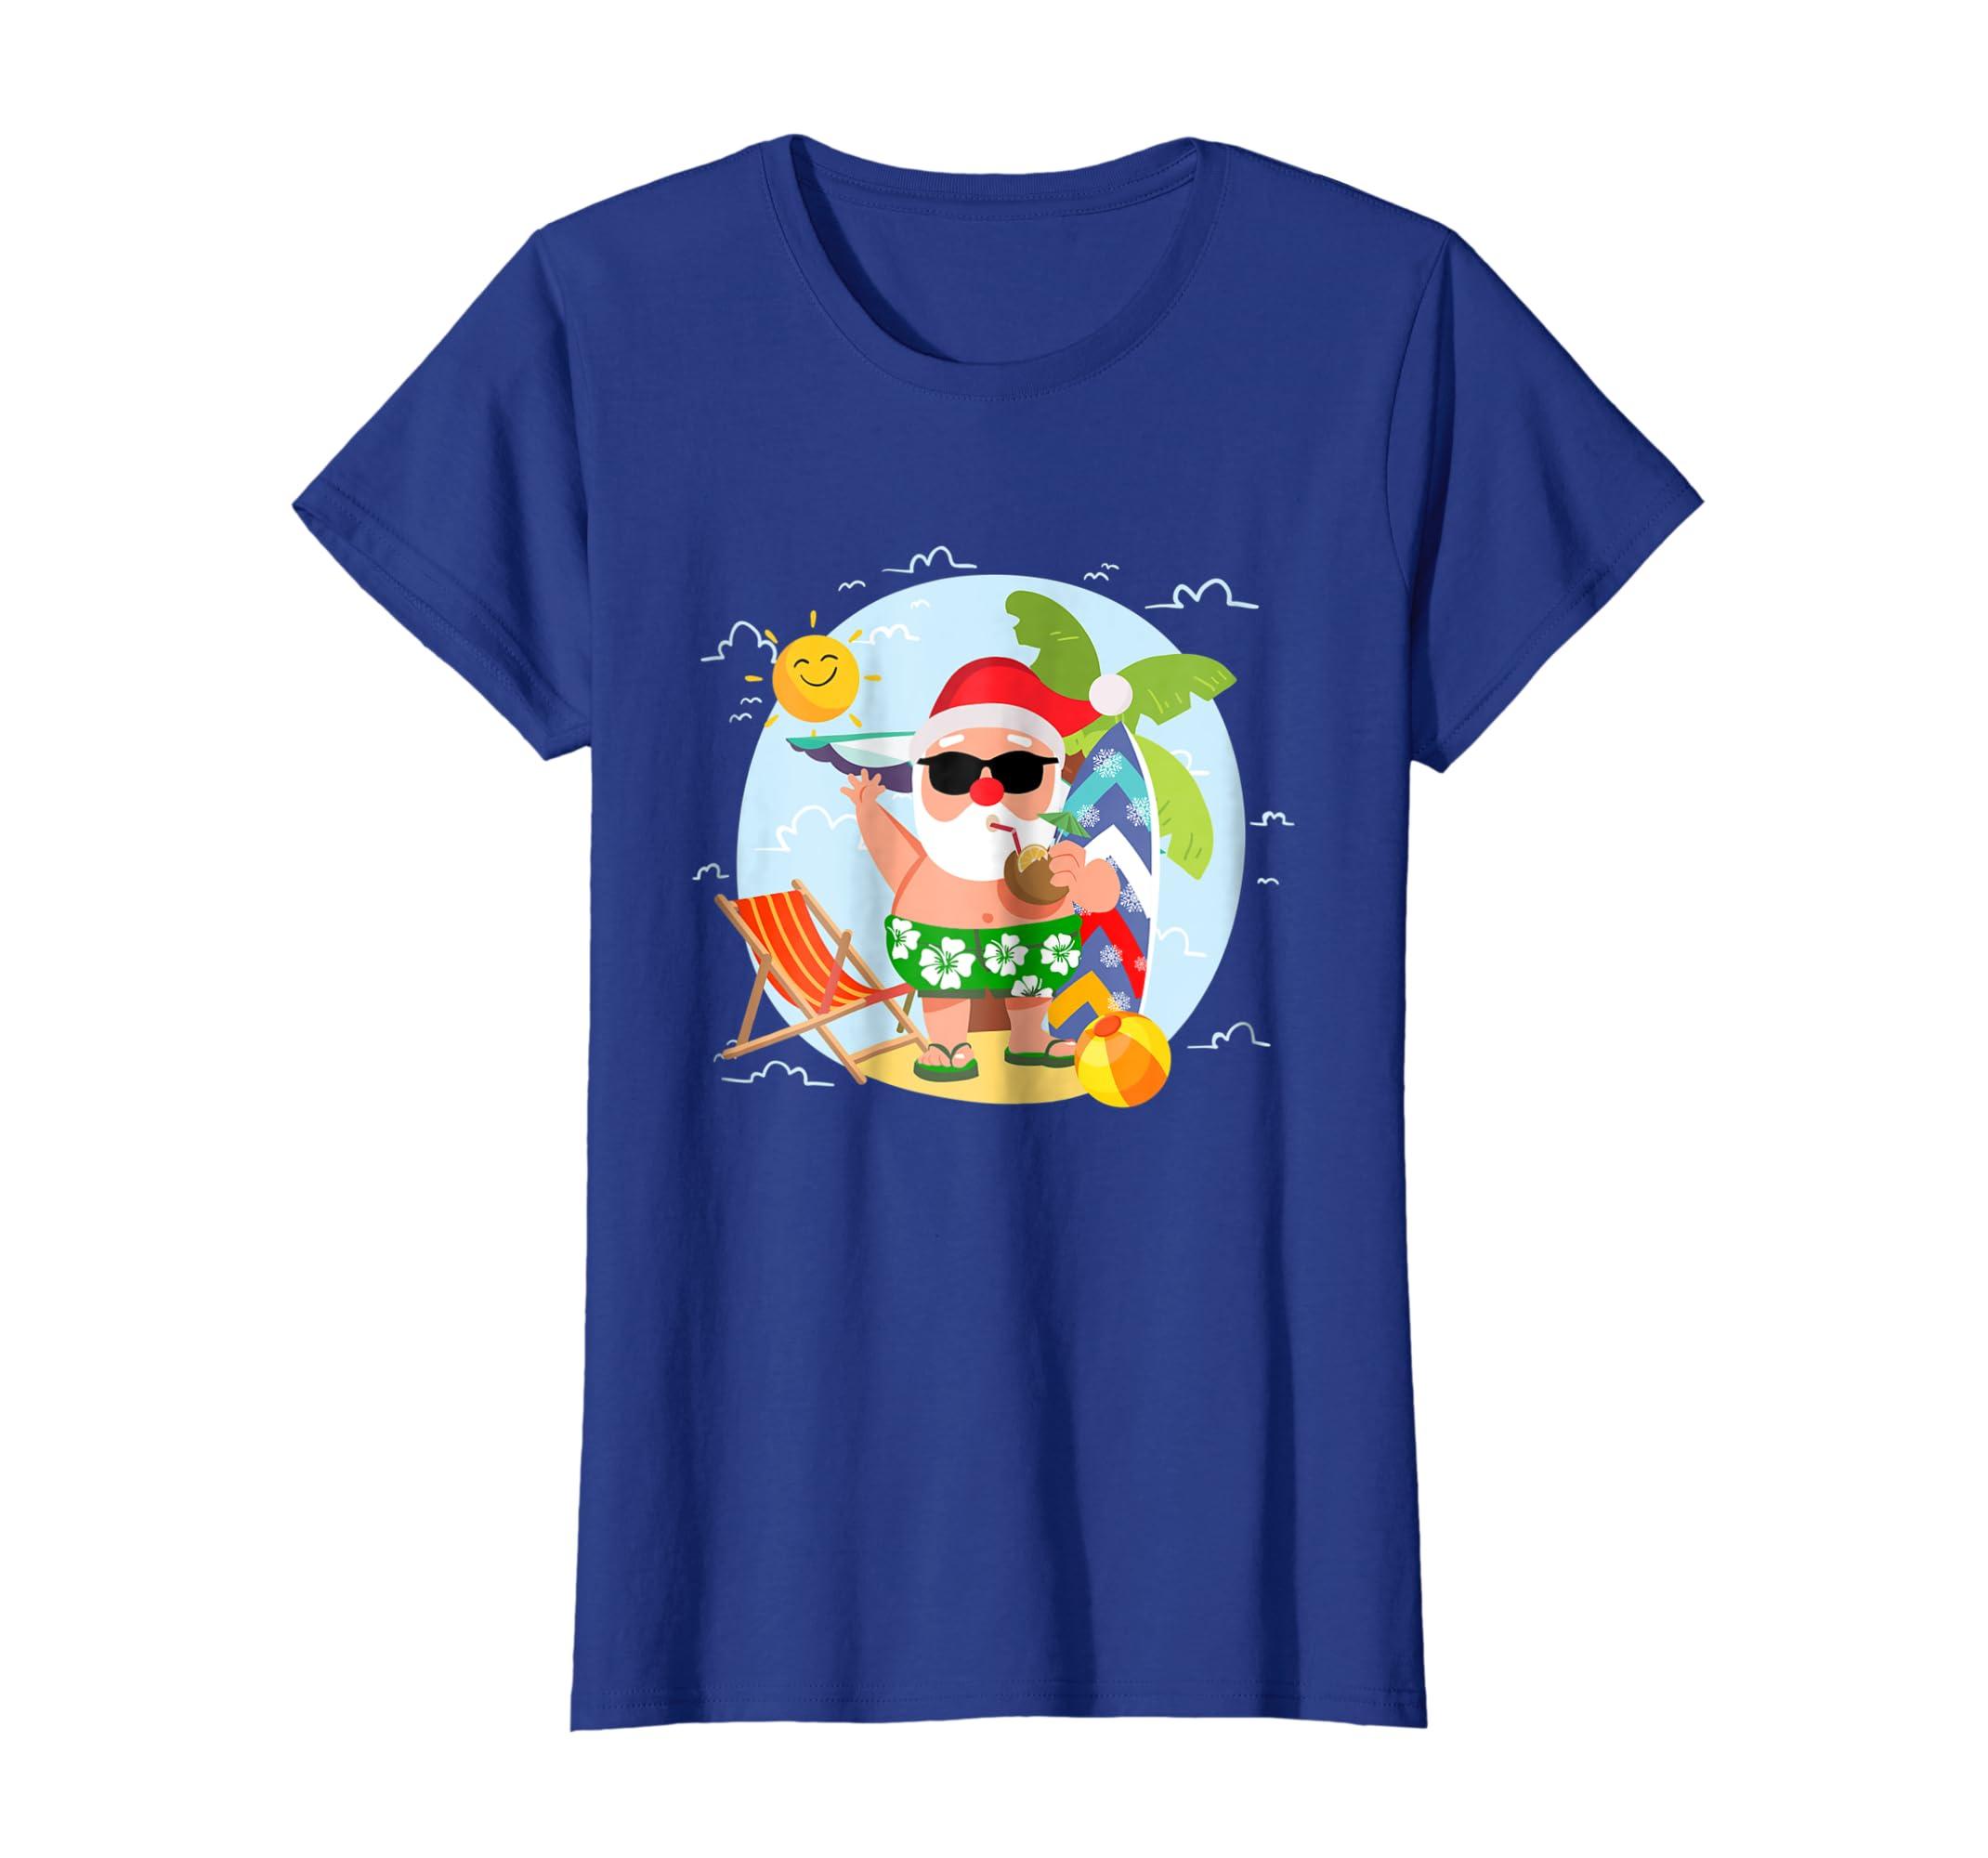 0cfd0766e66 Amazon.com  Santa Claus Surfing Hawaiian Shirt Summer Christmas Outfit   Clothing